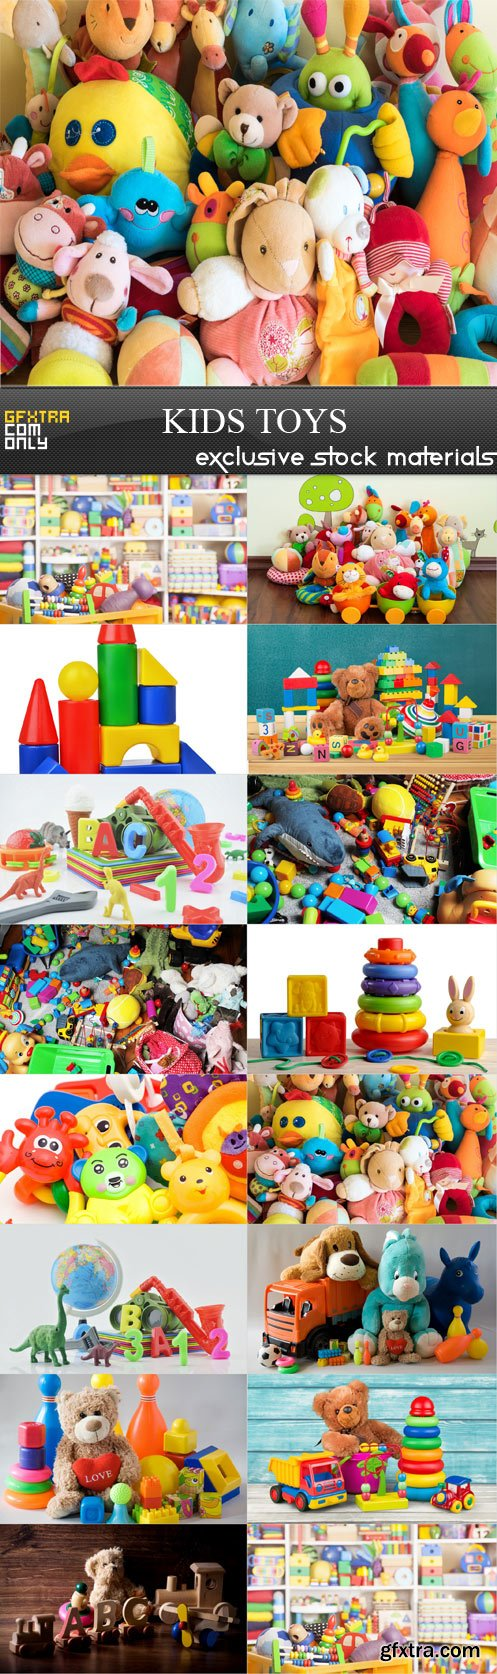 Kids toys - 15 JPEG